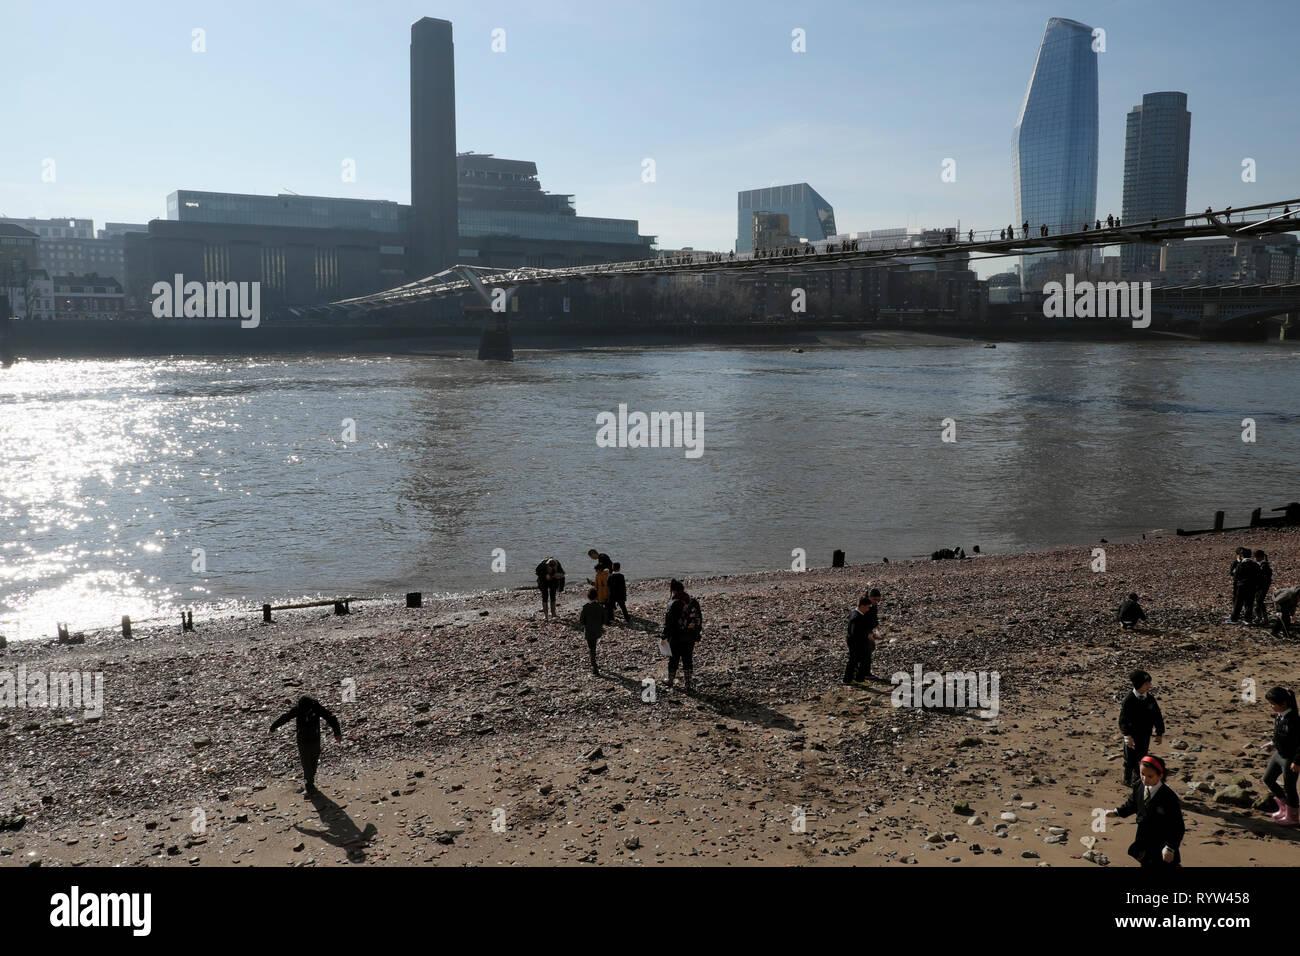 View of River Thames at low tide Tate Modern Art Gallery building & British primary schoolchildren mudlarking London UK Great Britain  KATHY DEWITT - Stock Image